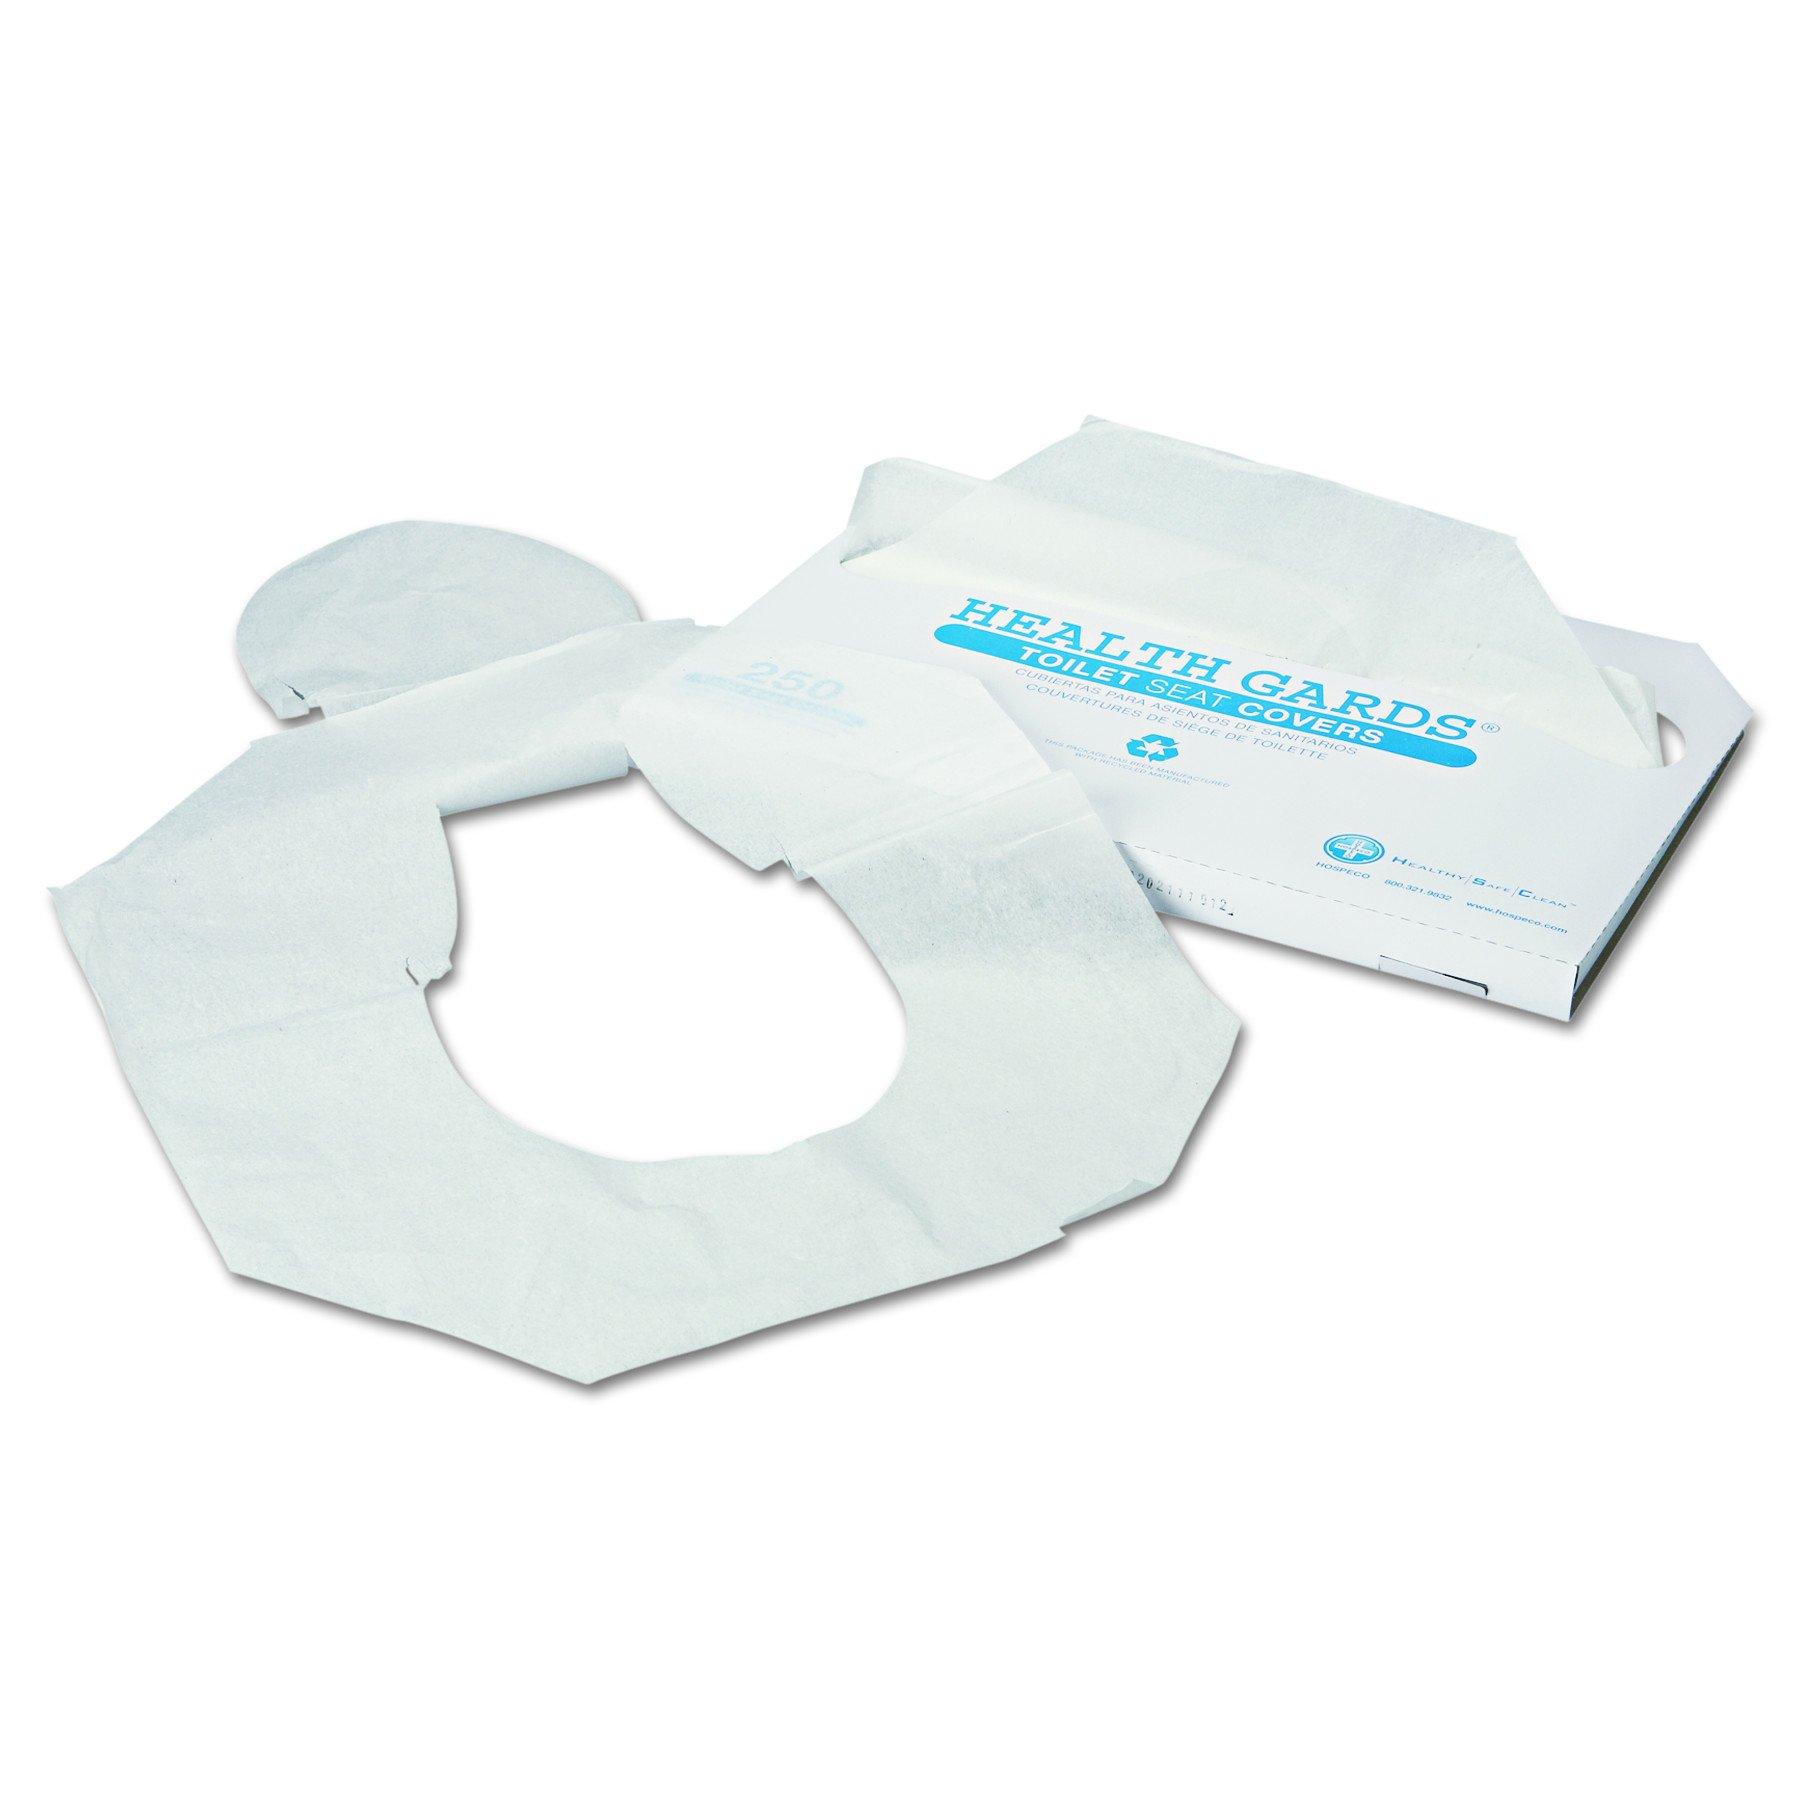 HOSPECO HG1000 Health Gards Toilet Seat Covers, Half-Fold, White, Pack of 250 (Case of 4)